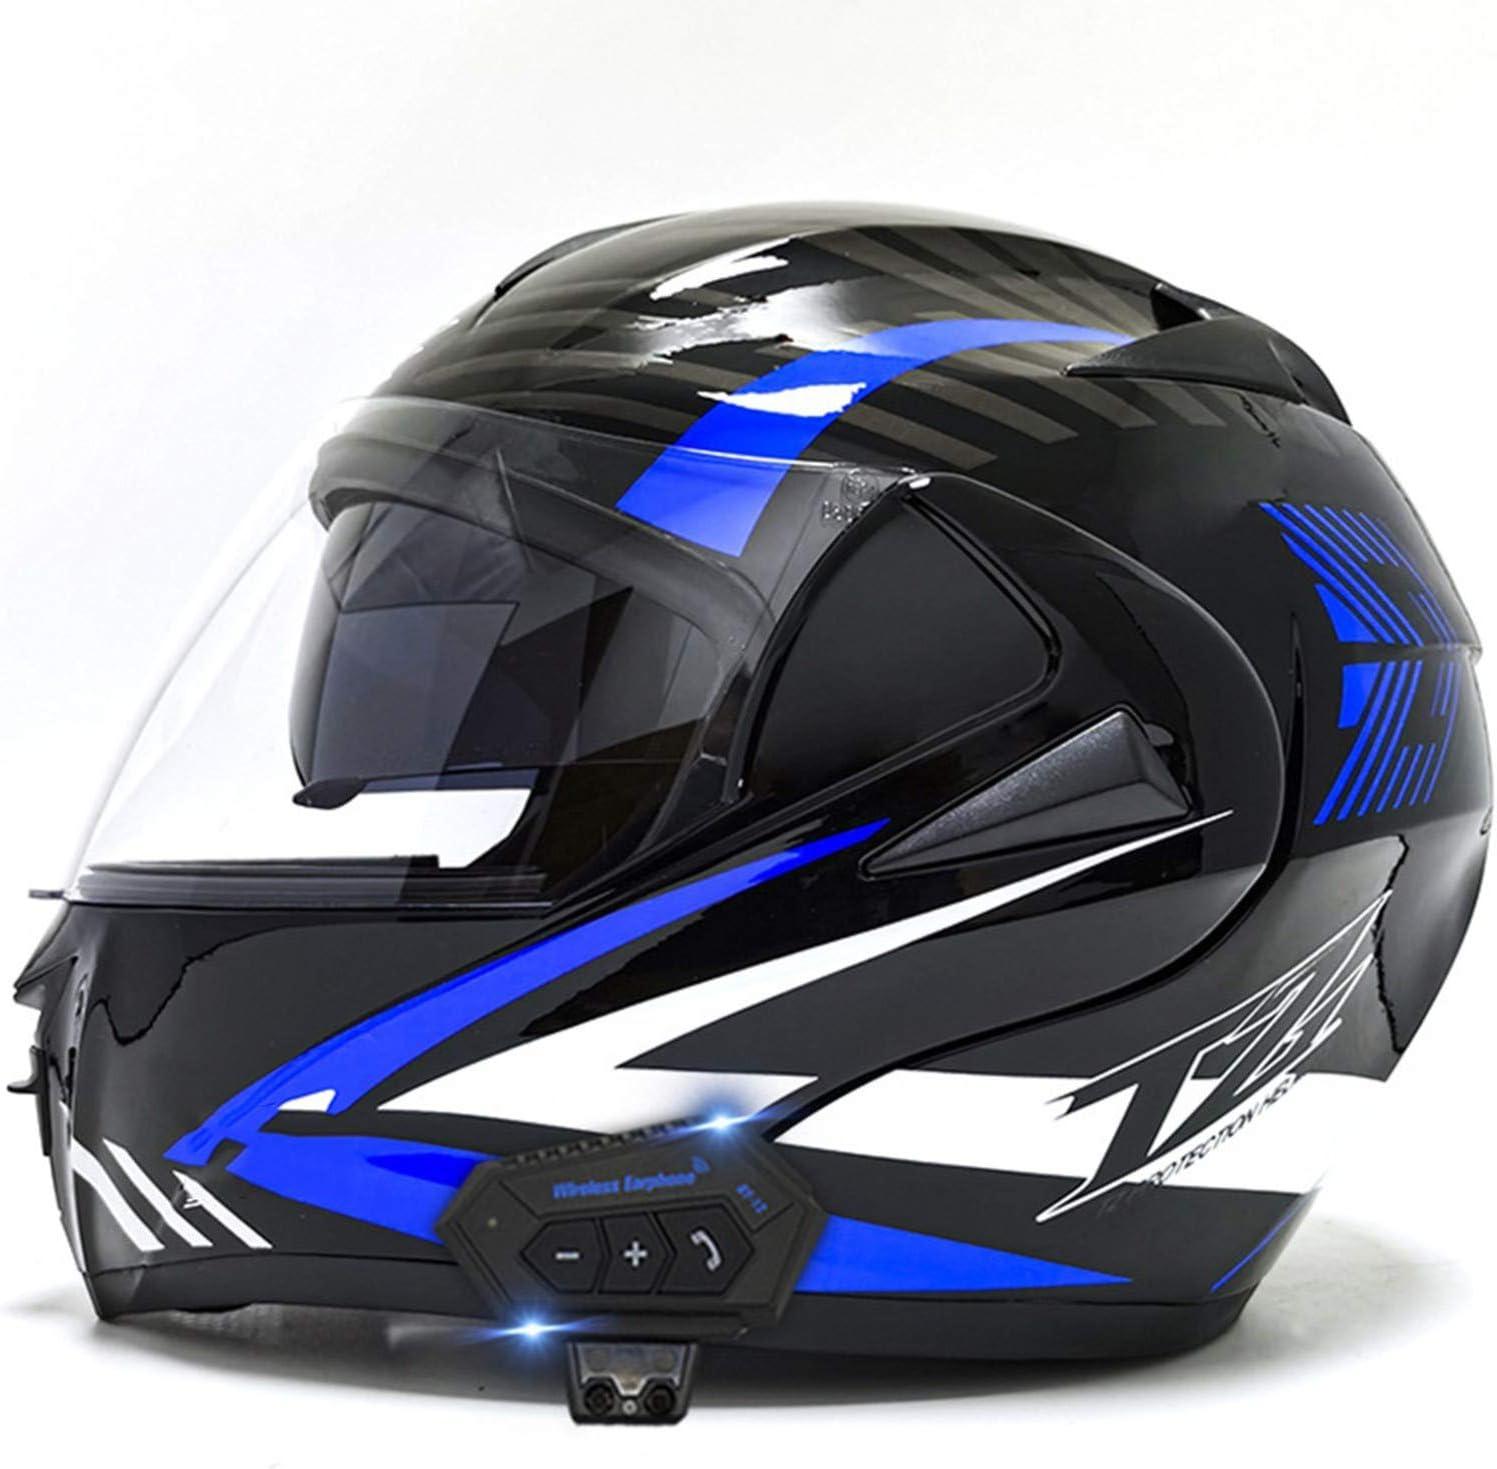 Flip-Up Helmets 2021 new Max 56% OFF Motorcycle Bluetooth Up Du Modular Flip